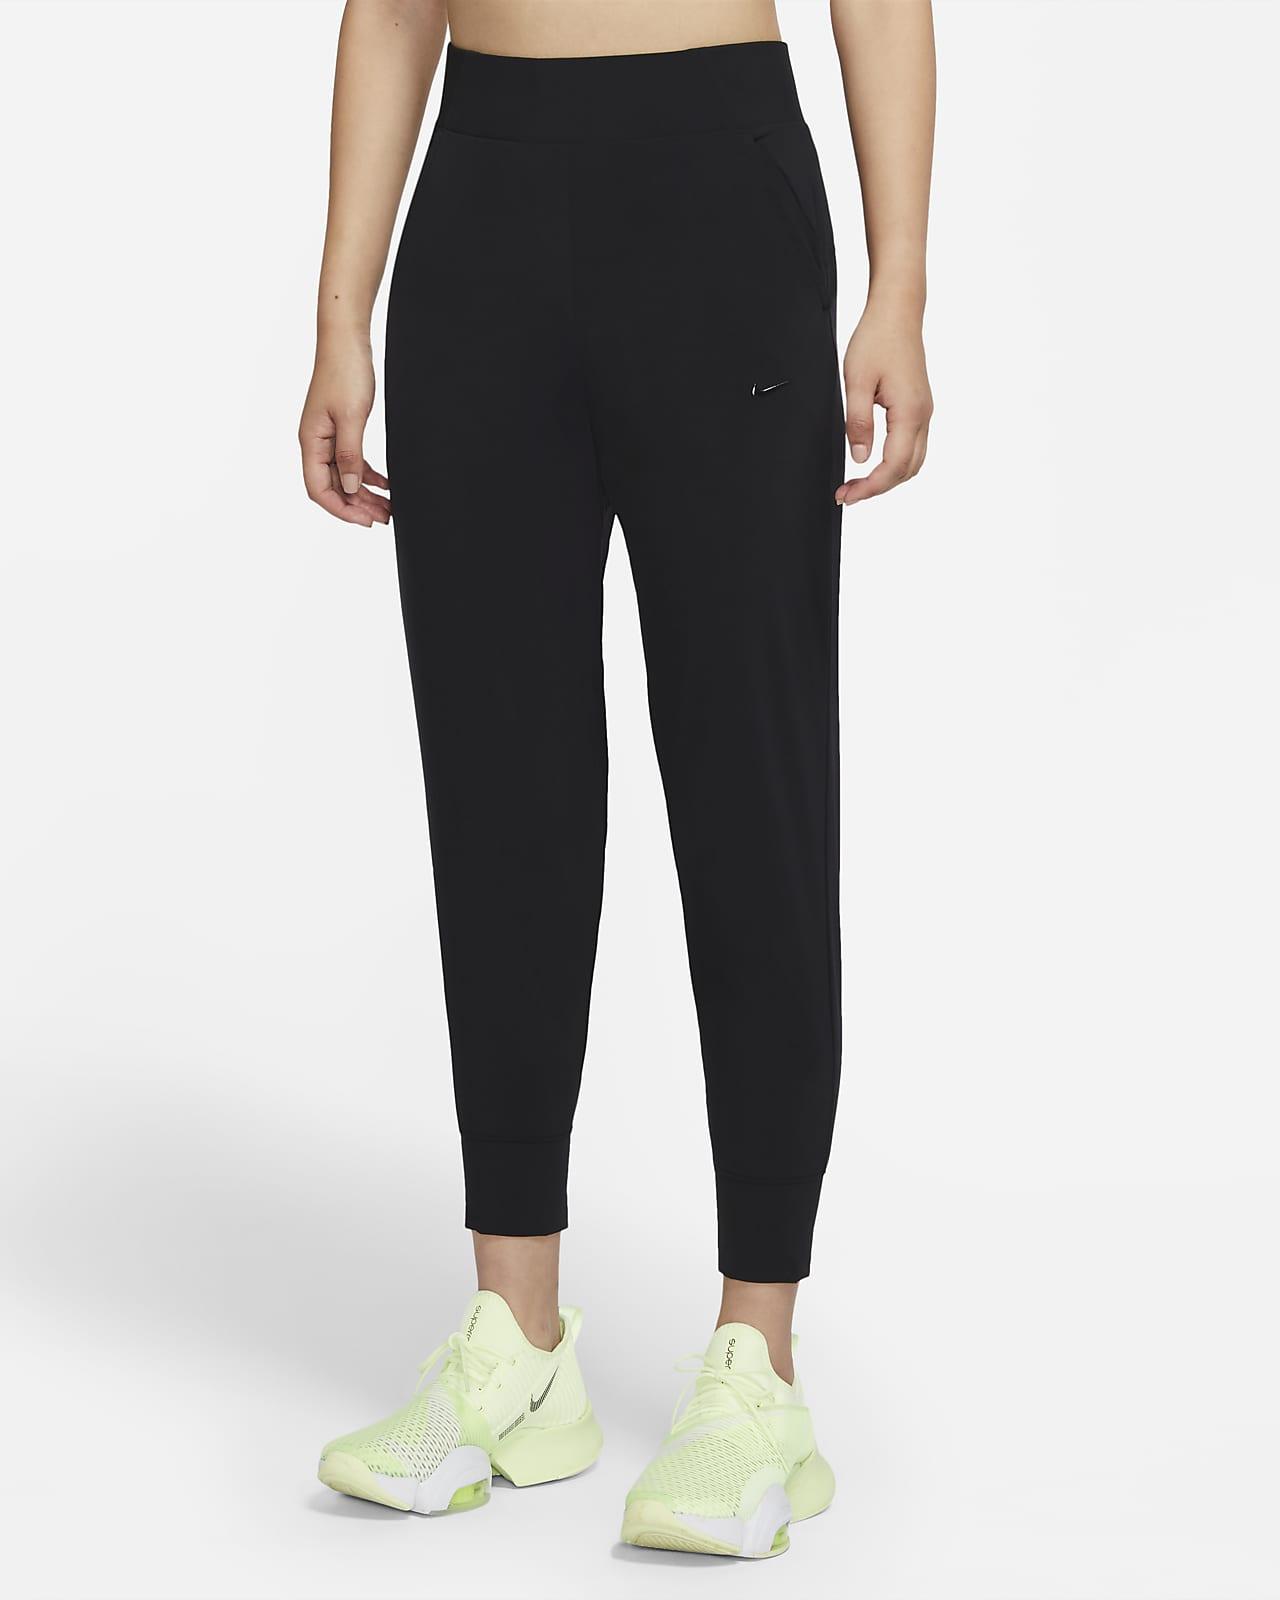 Nike Bliss Luxe 女款訓練長褲